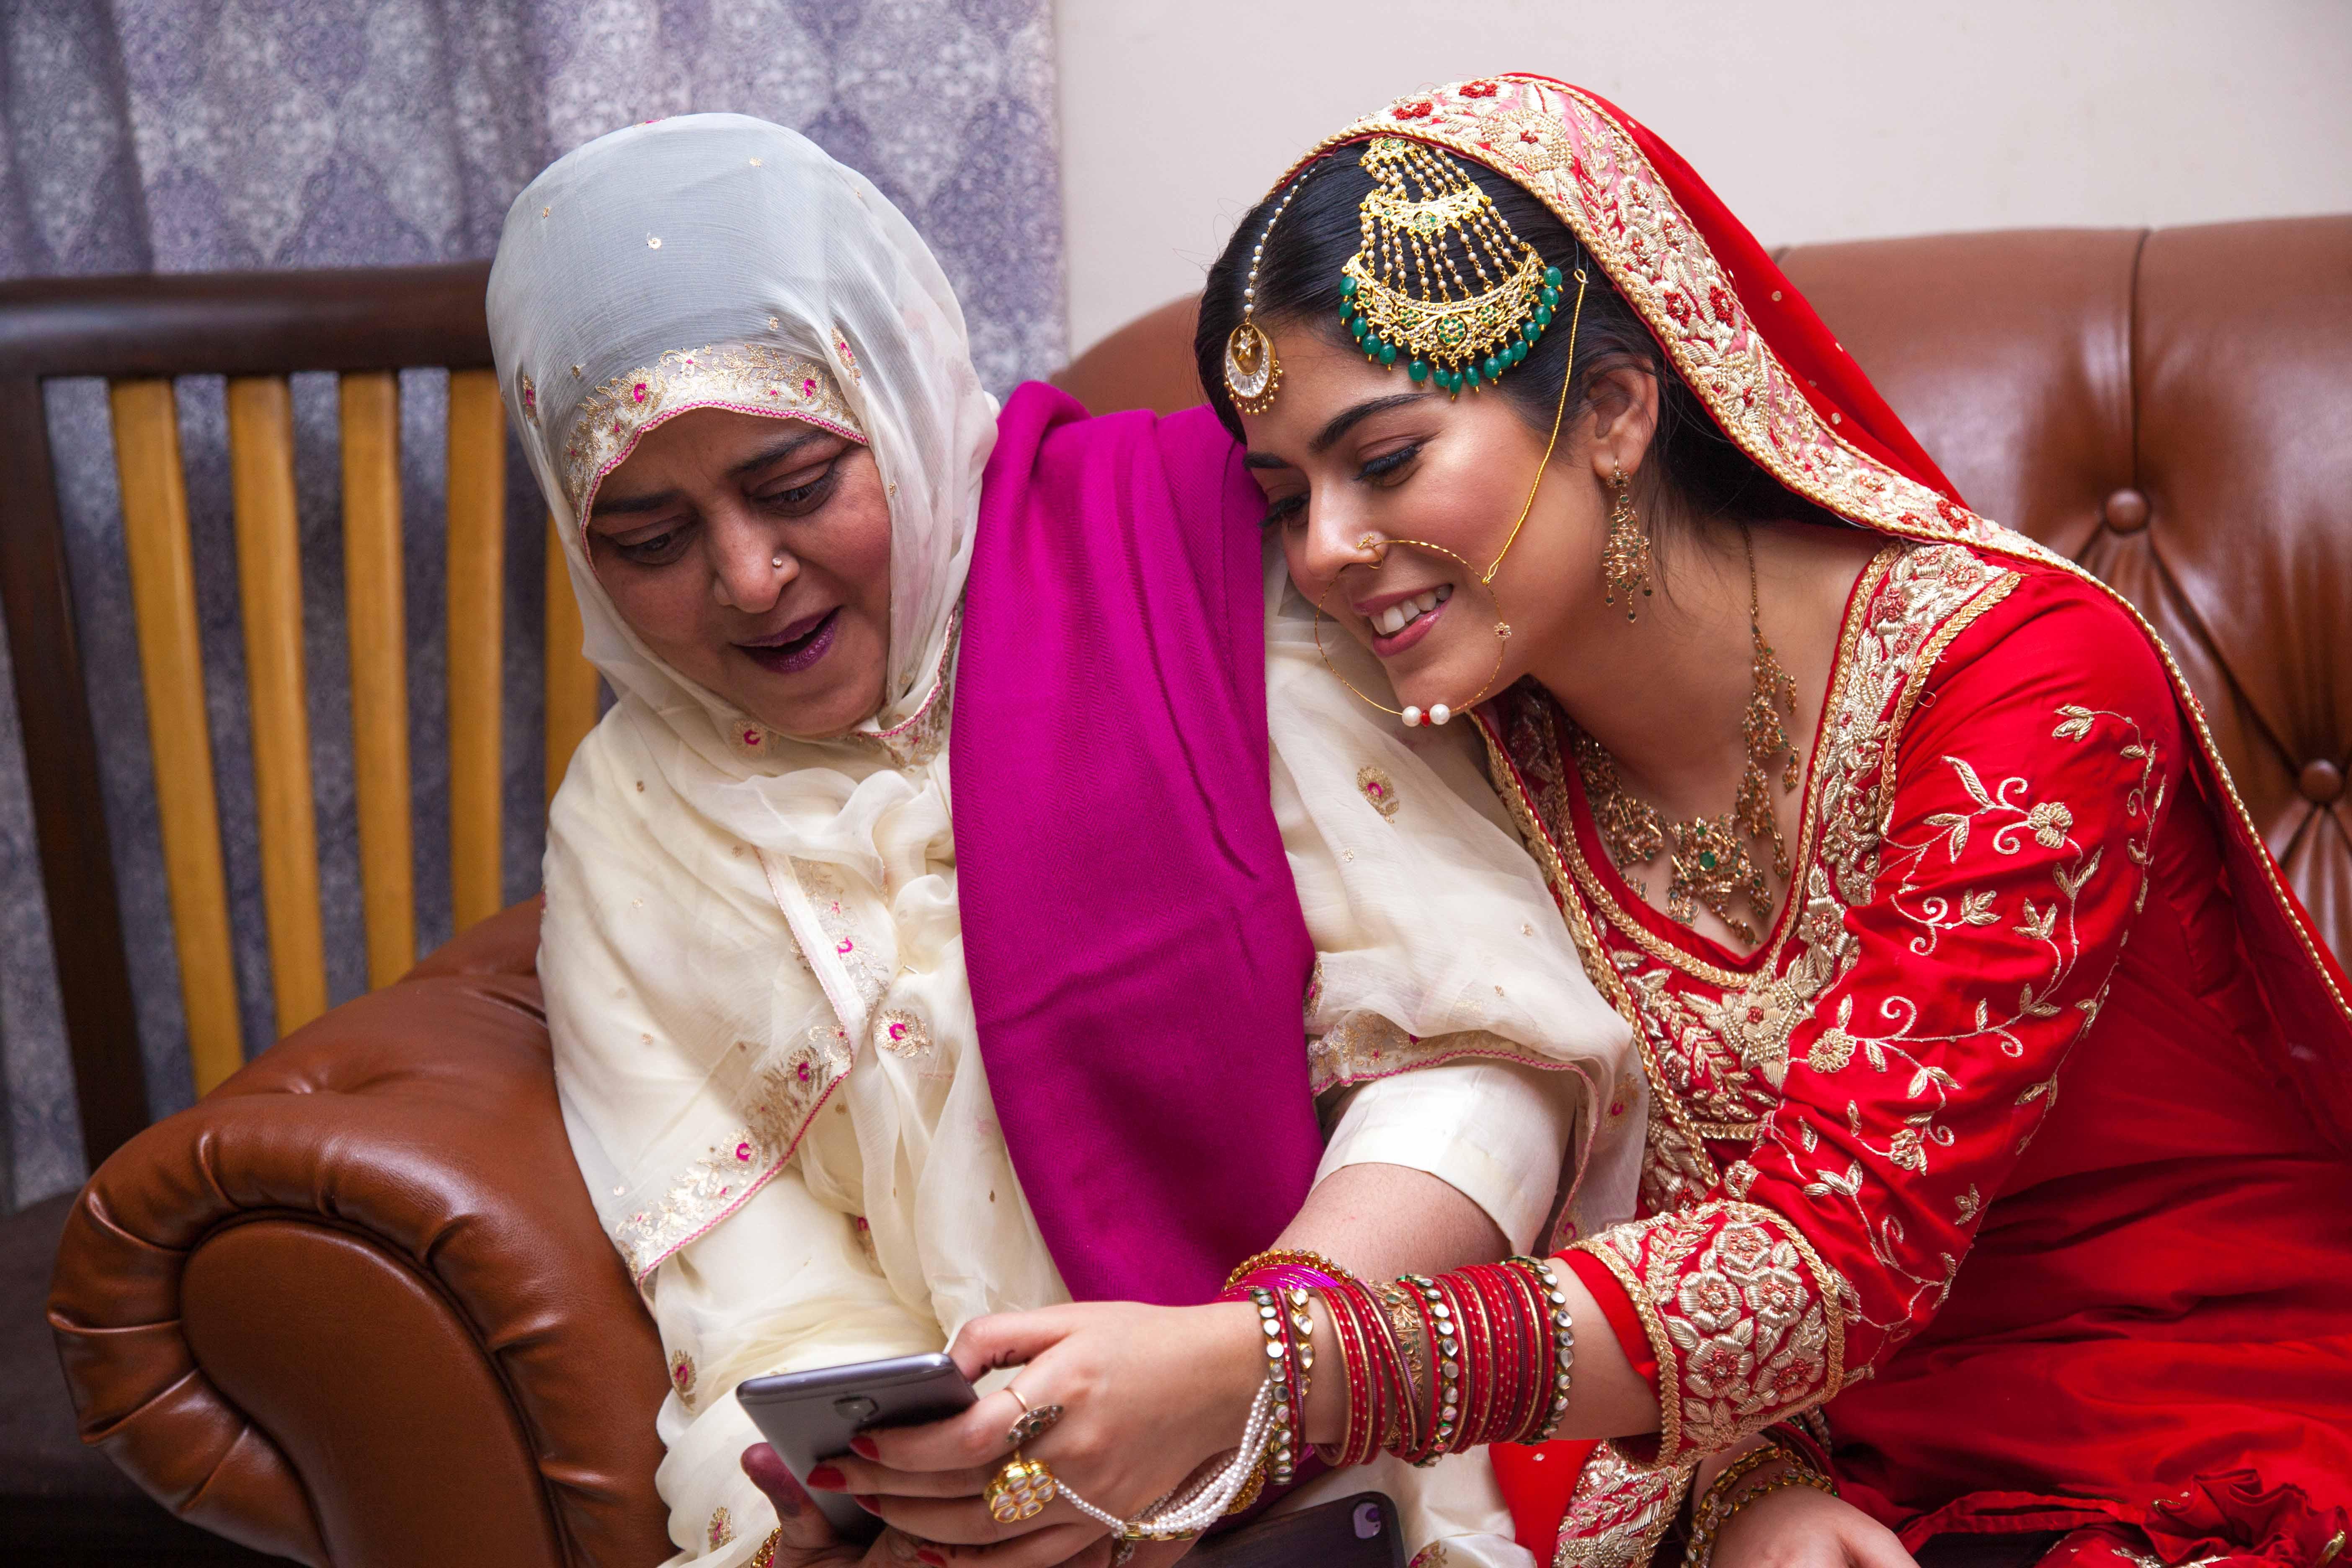 nikah, muslim bride, mother of the bride, wedding moments, wedding photographer, camera waale baraati